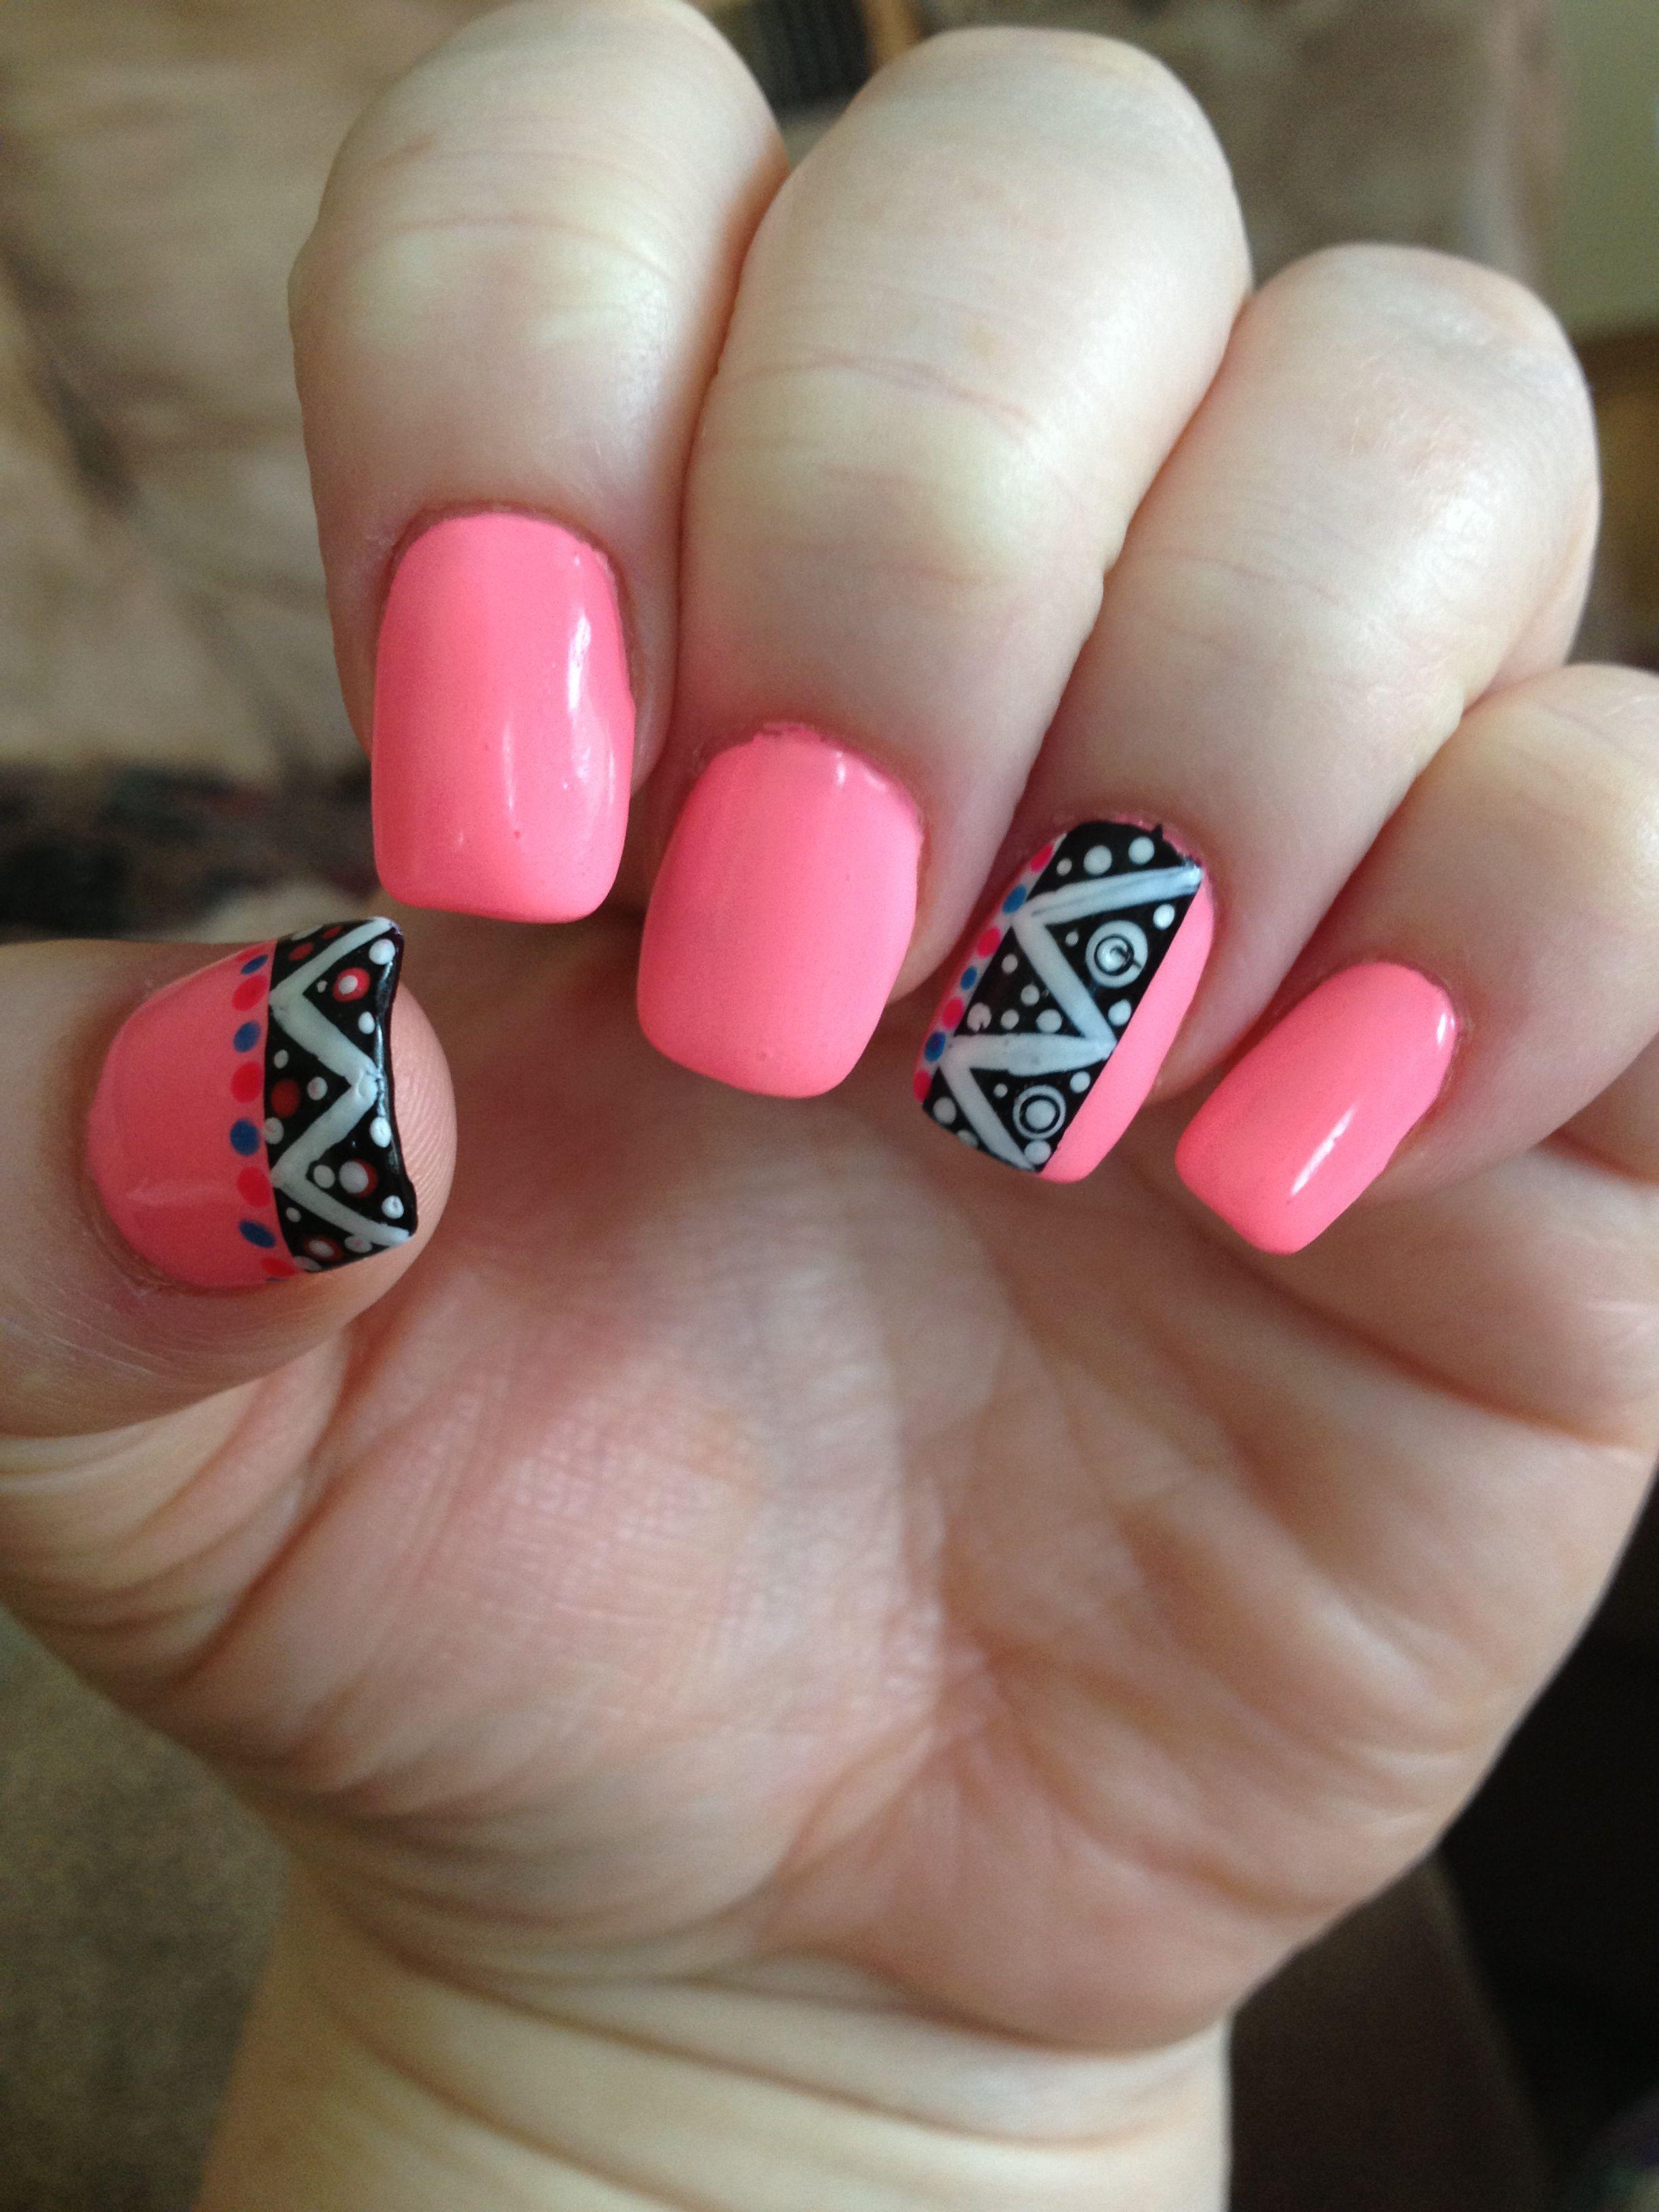 Aztec Nails | Nail Designs | Pinterest | Aztec nails, Aztec and Nail ...